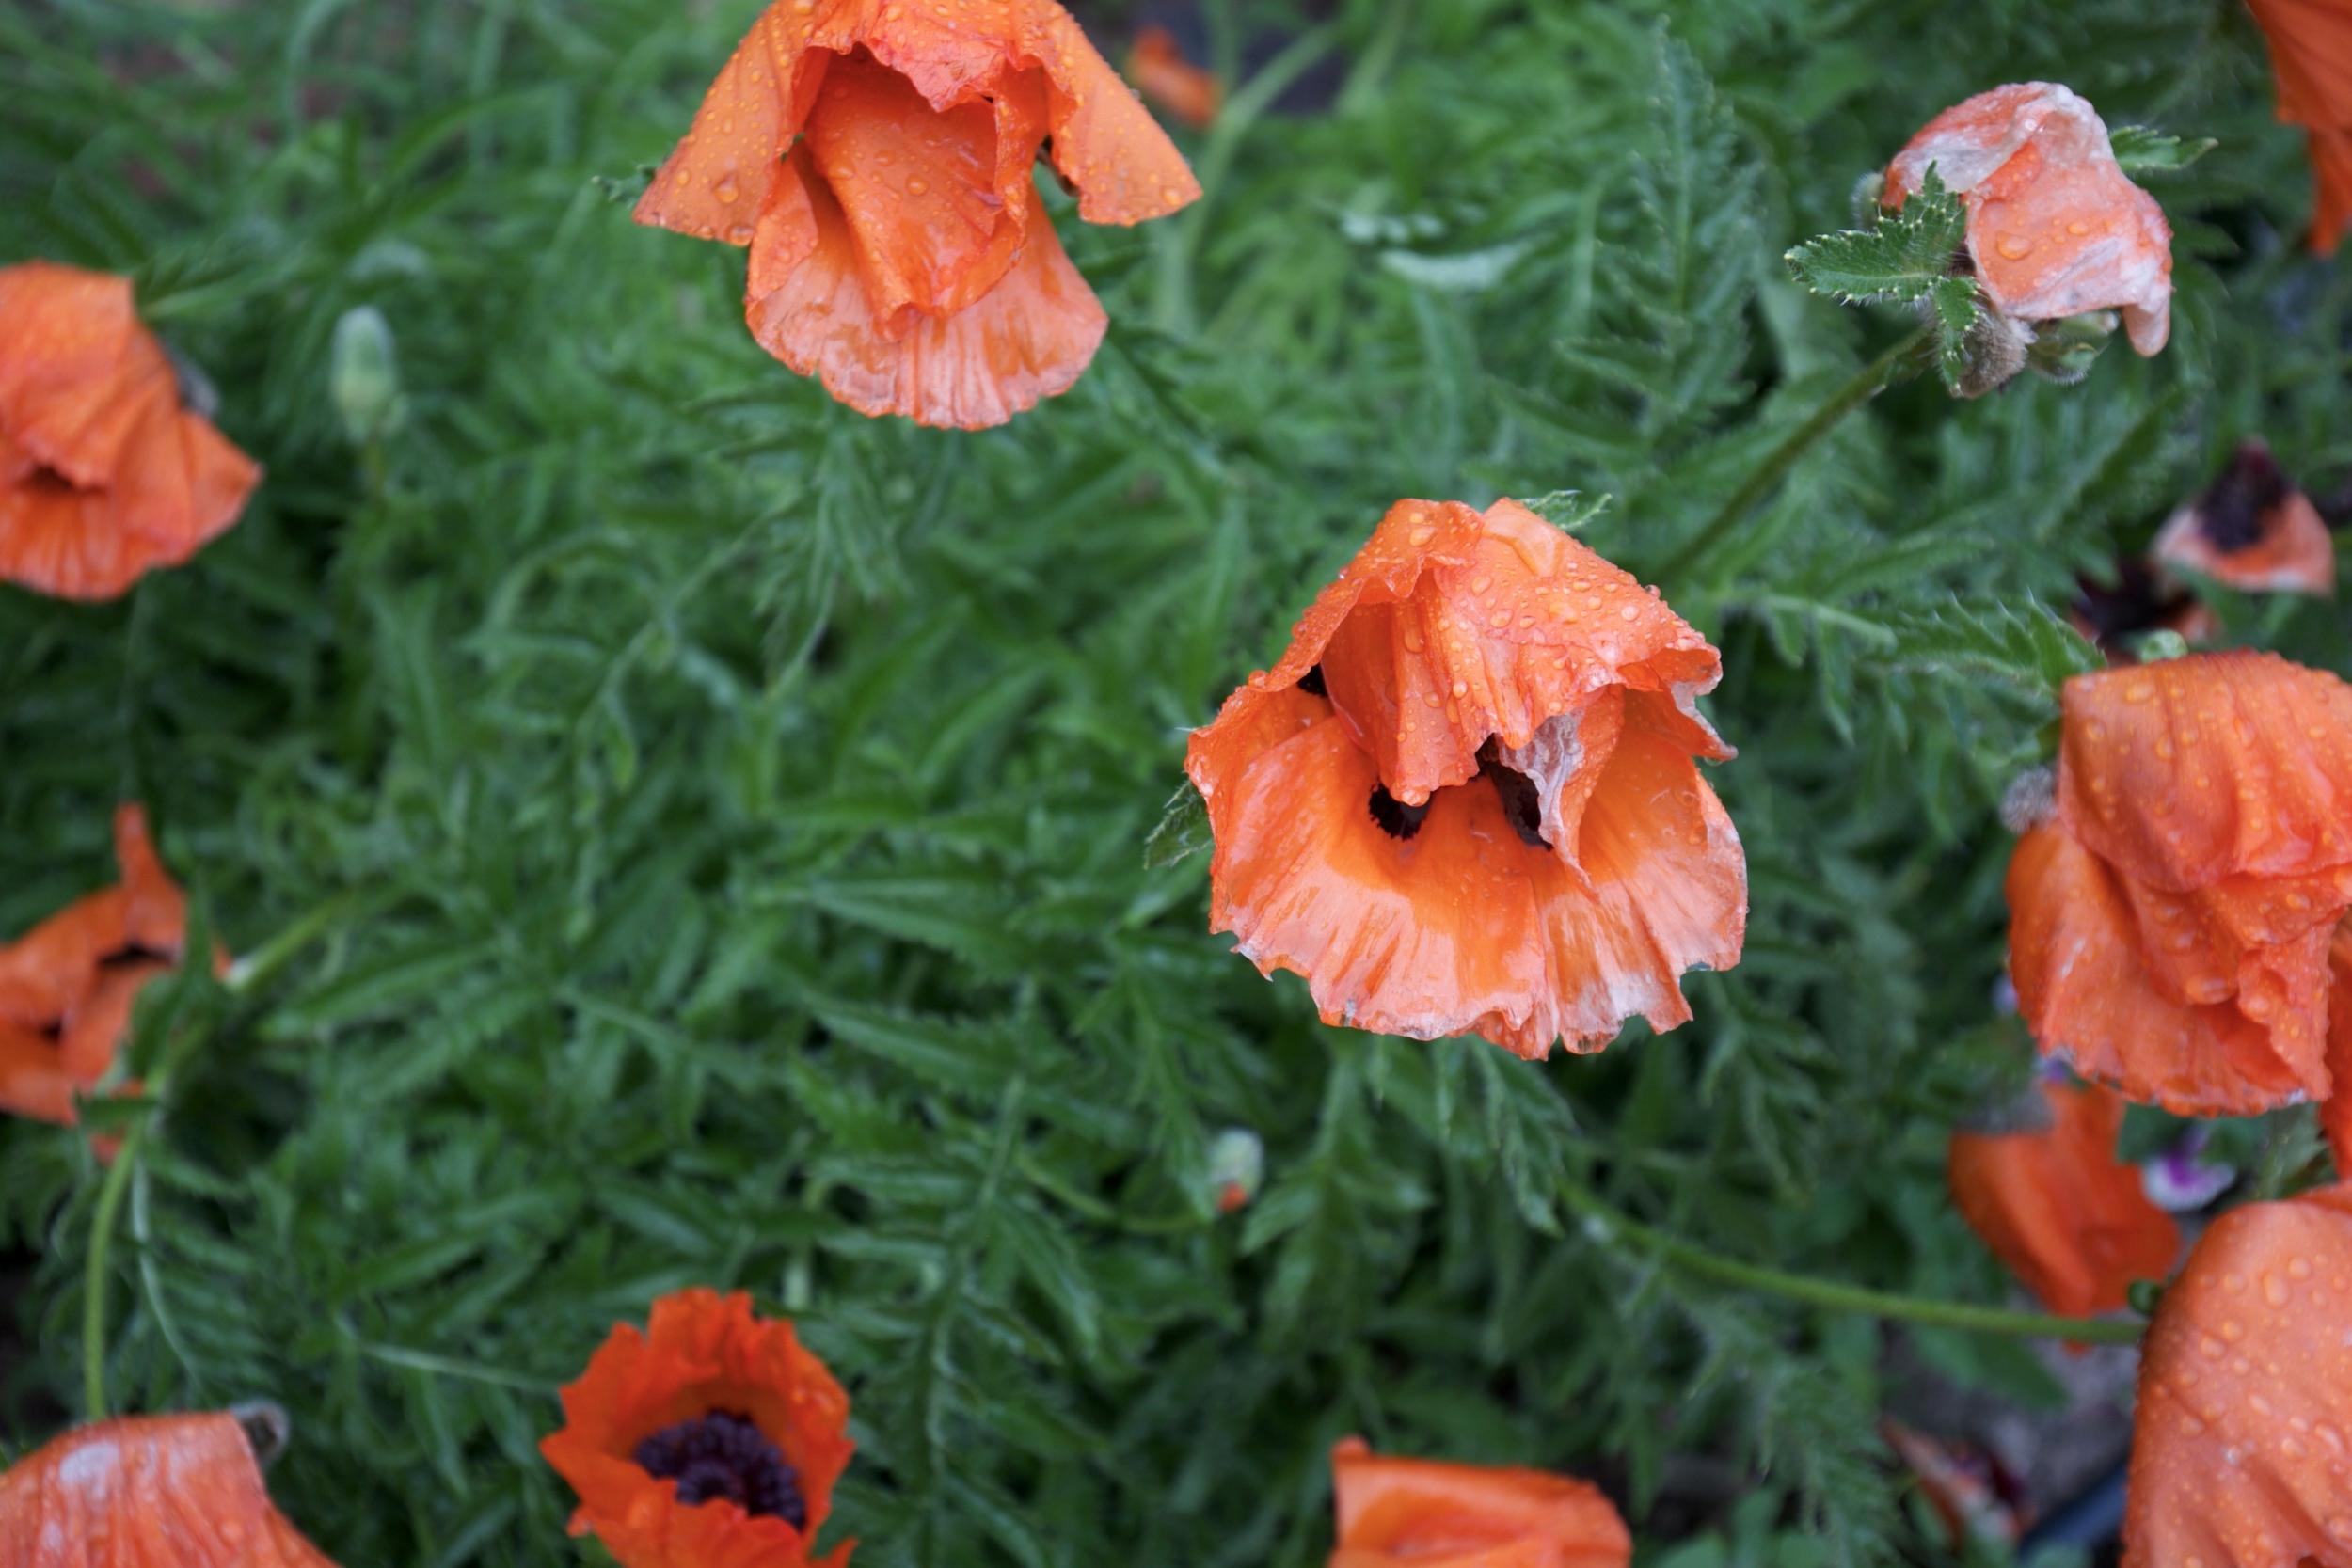 Orange poppies in the rain.